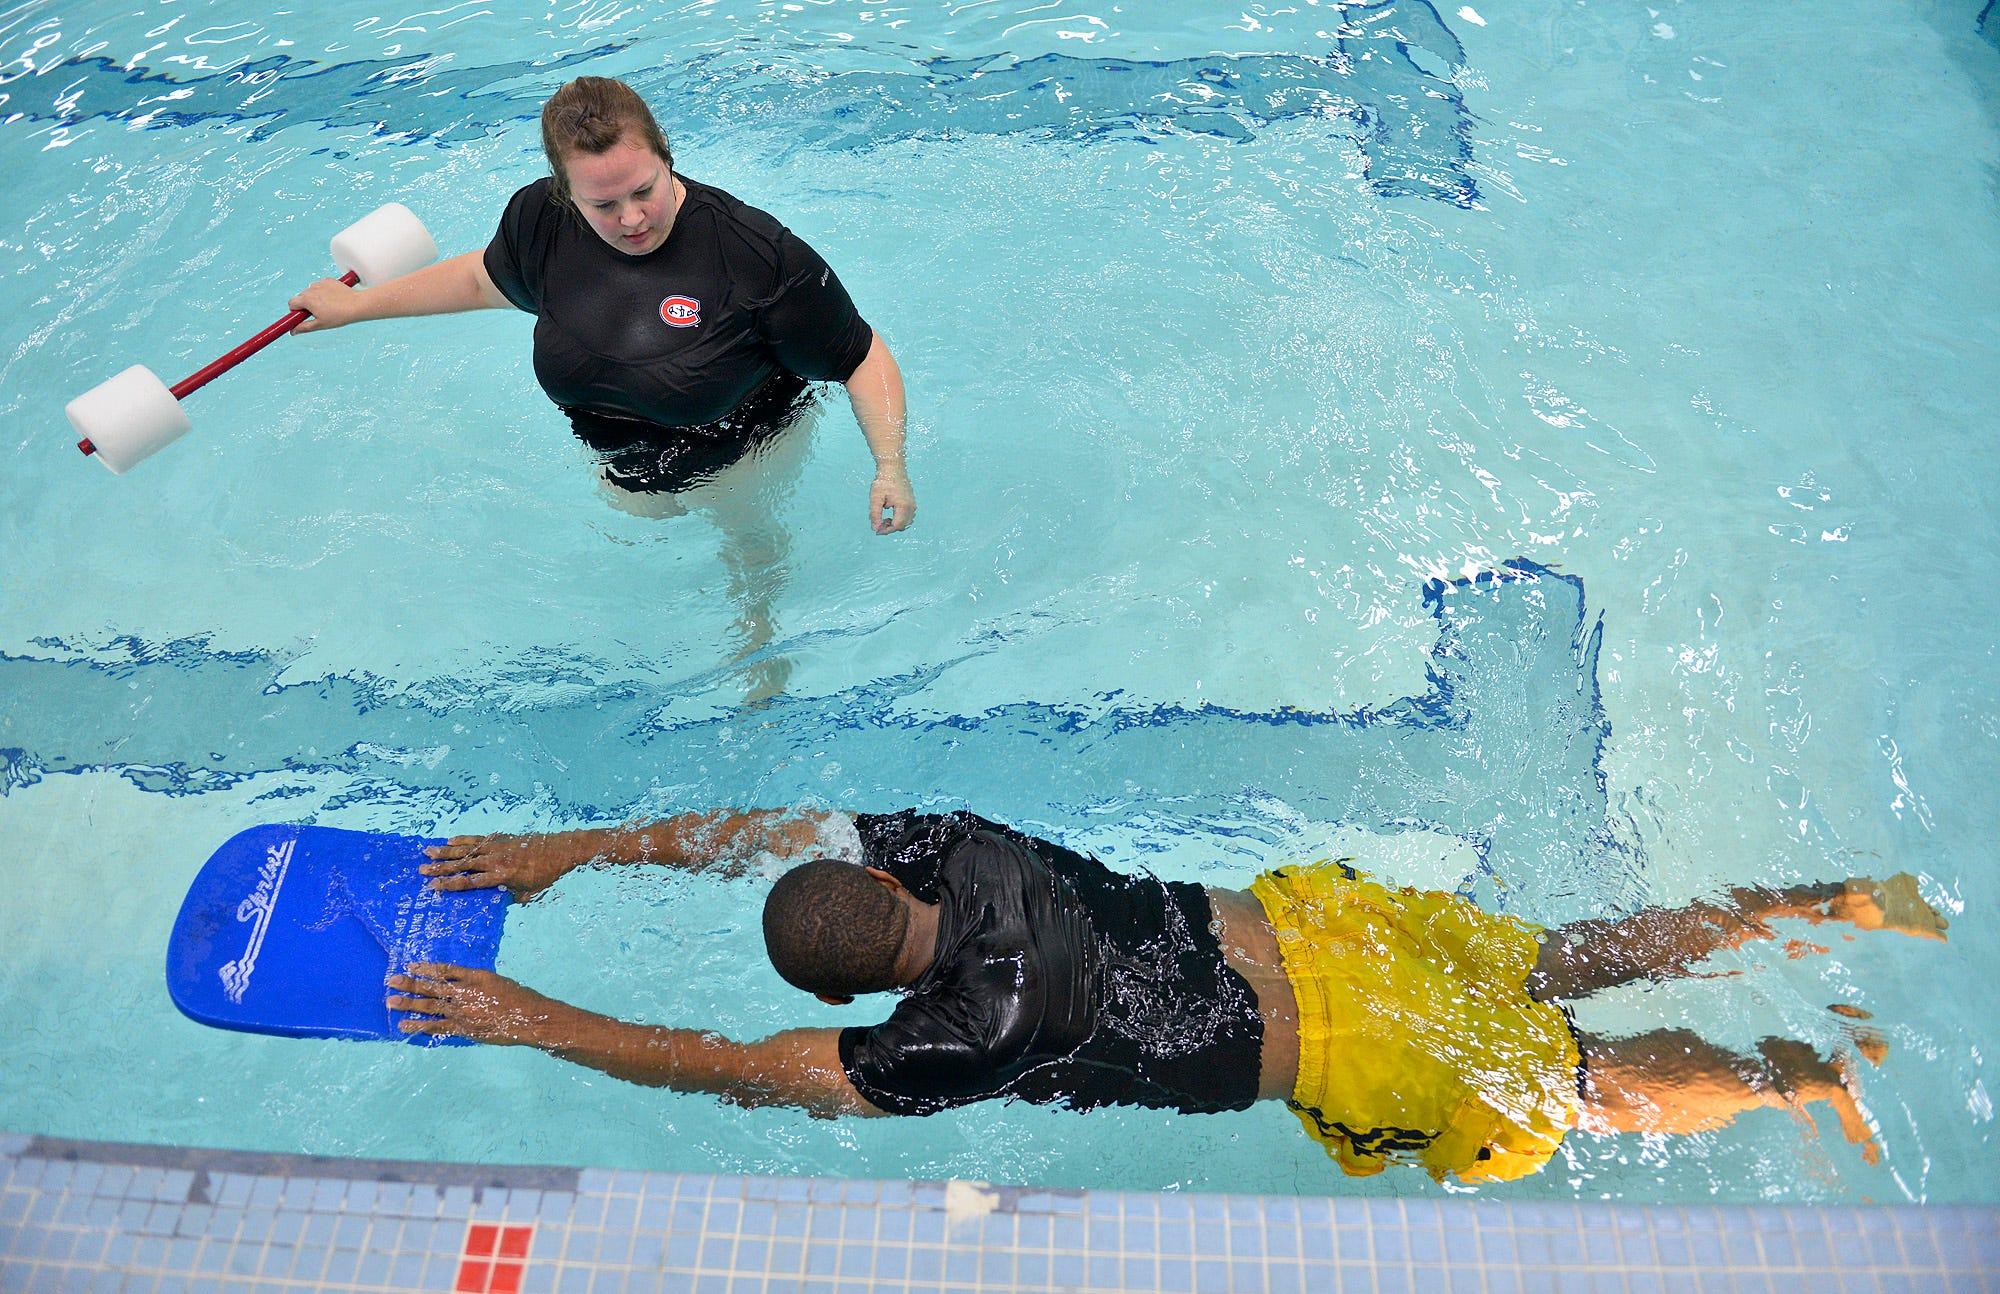 XXX AP206084061390. Megan Balach Watches An Adult Swimming Studentu0027s  Technique ...